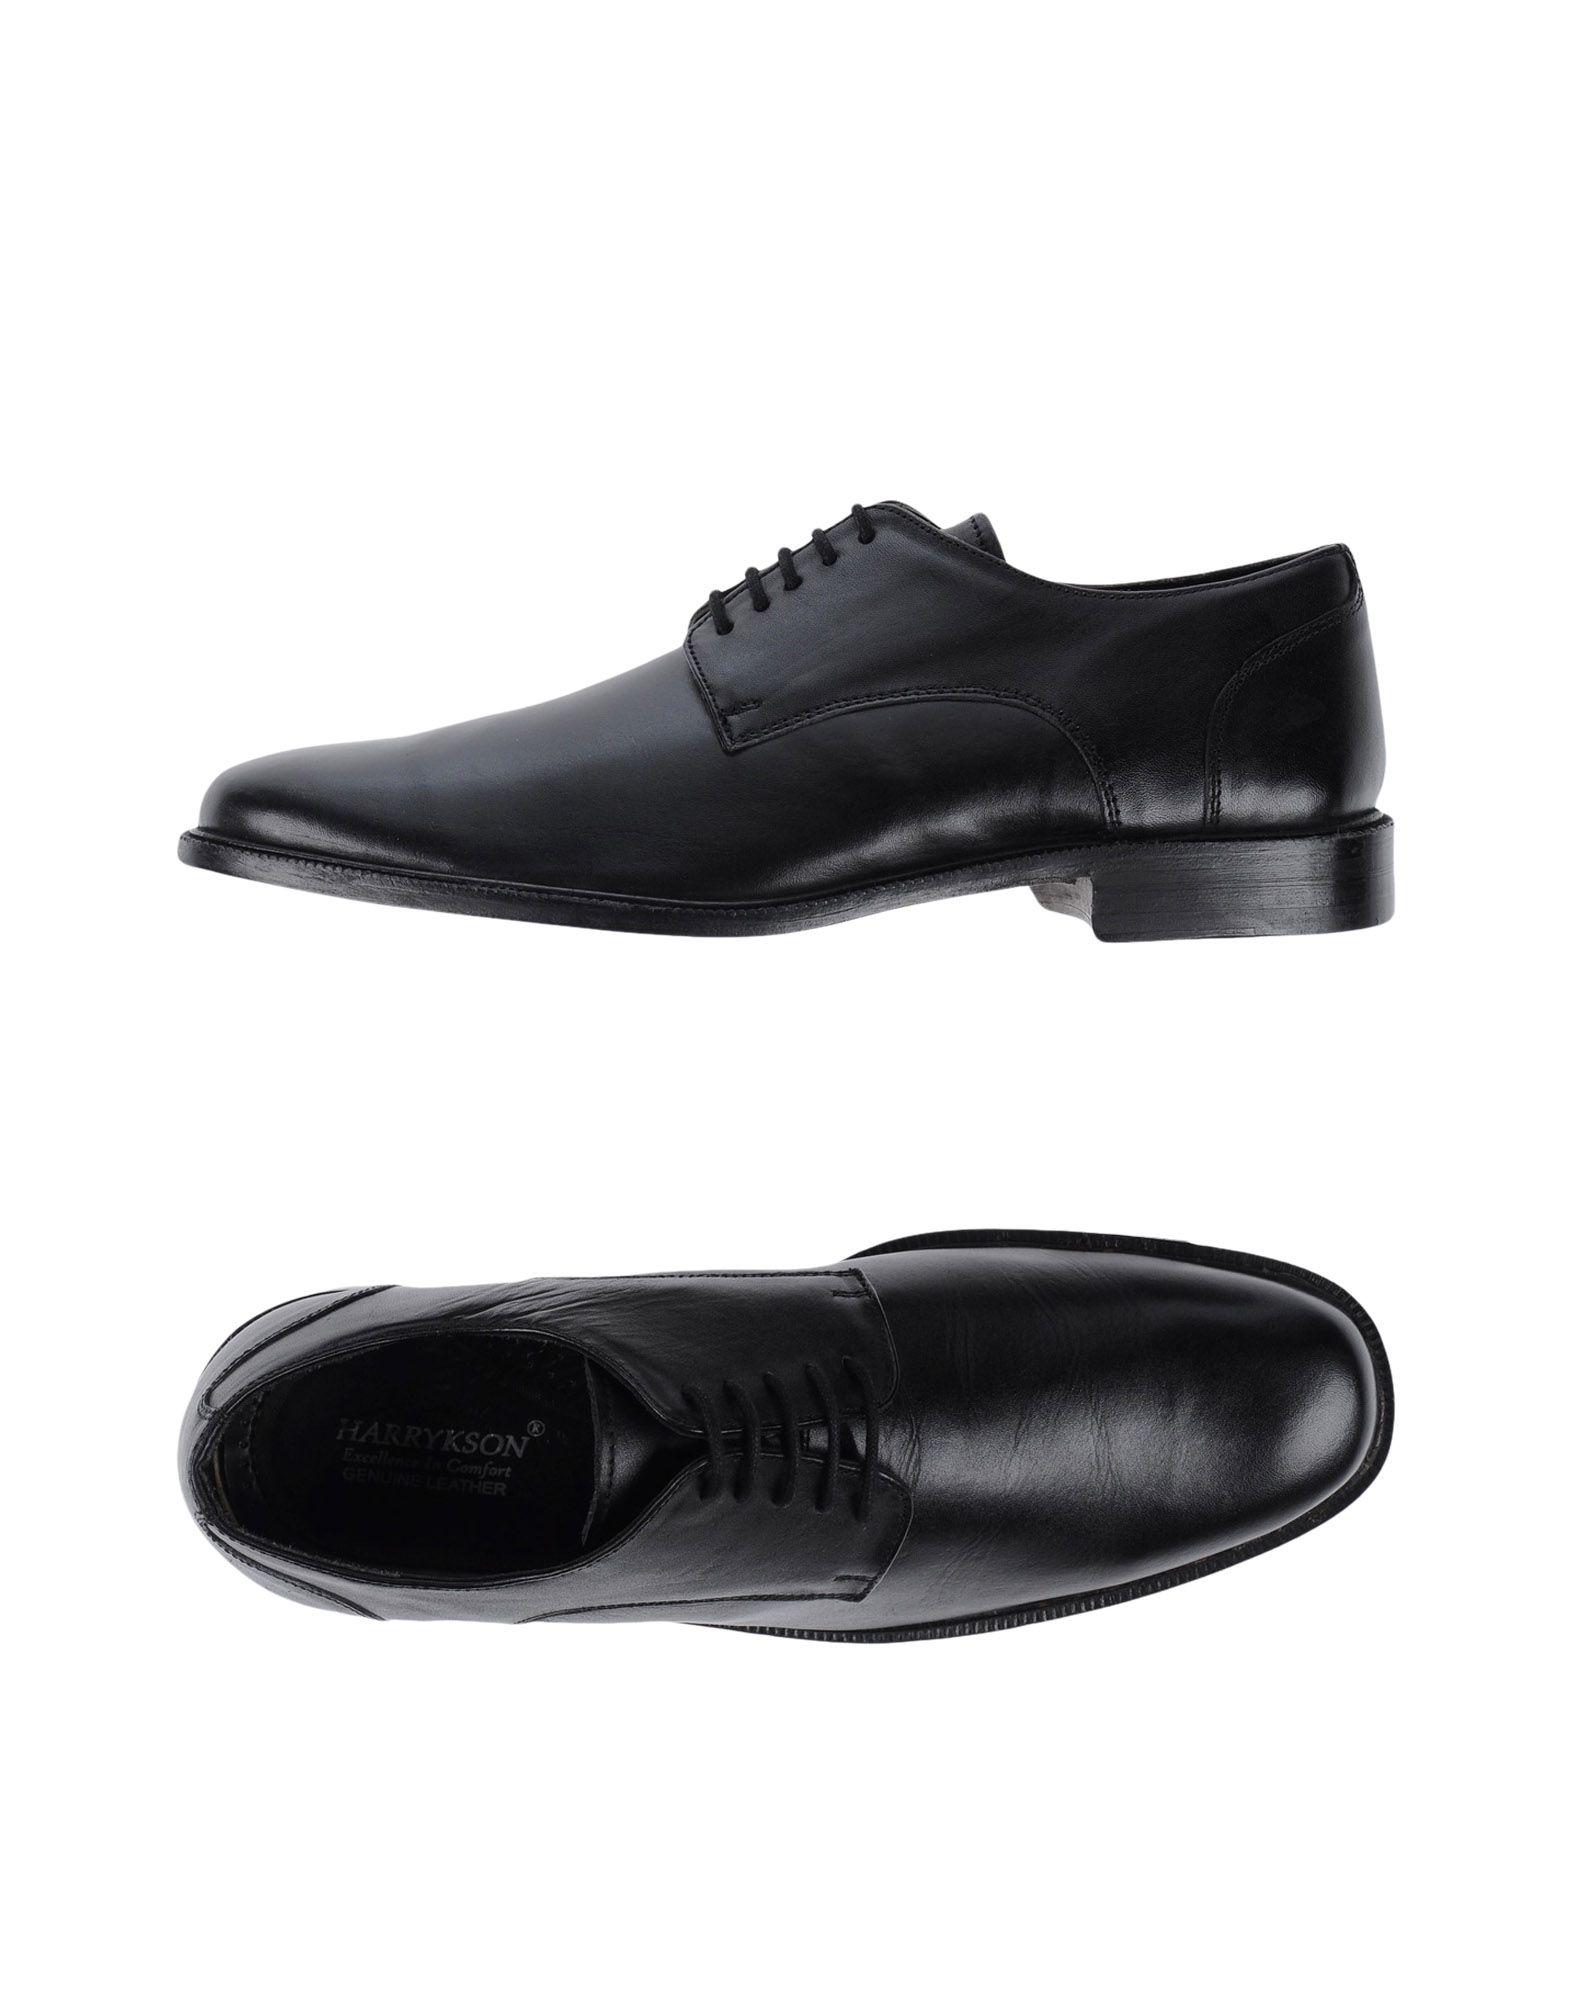 Rabatt echte Schuhe Harrykson® Schnürschuhe Herren  11075833SM